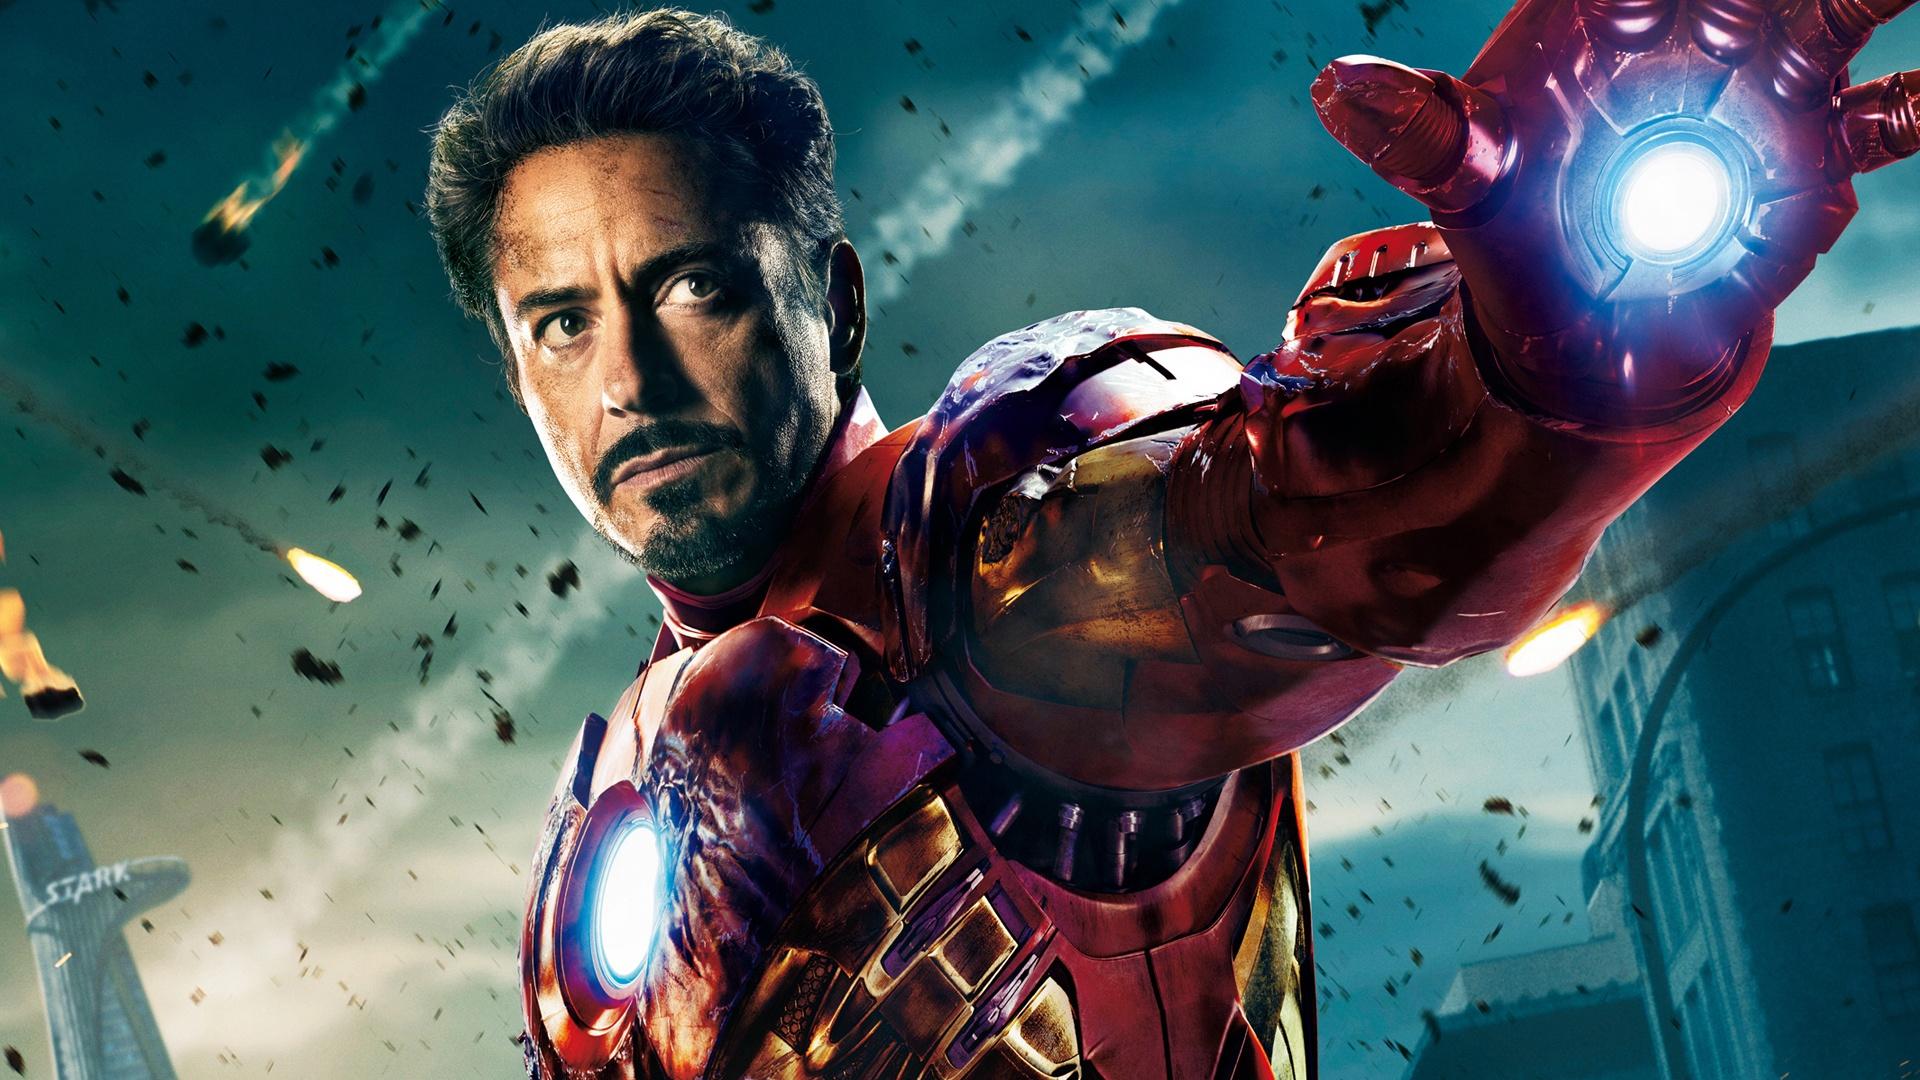 Iron Man Hd Wallpaper 1920x1080 43342